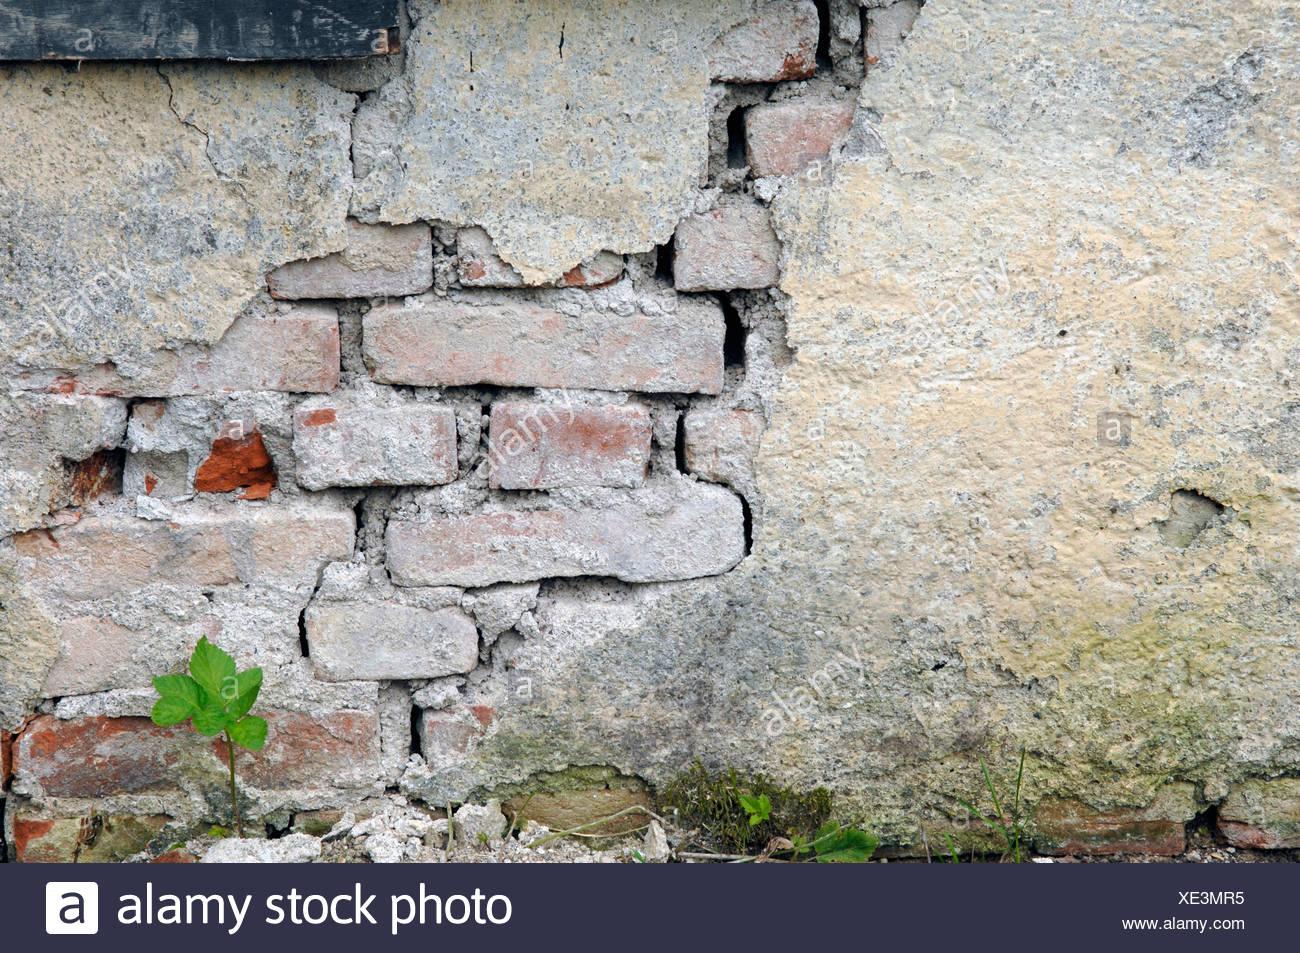 Germany, Munich, Broken wall at demolition house - Stock Image